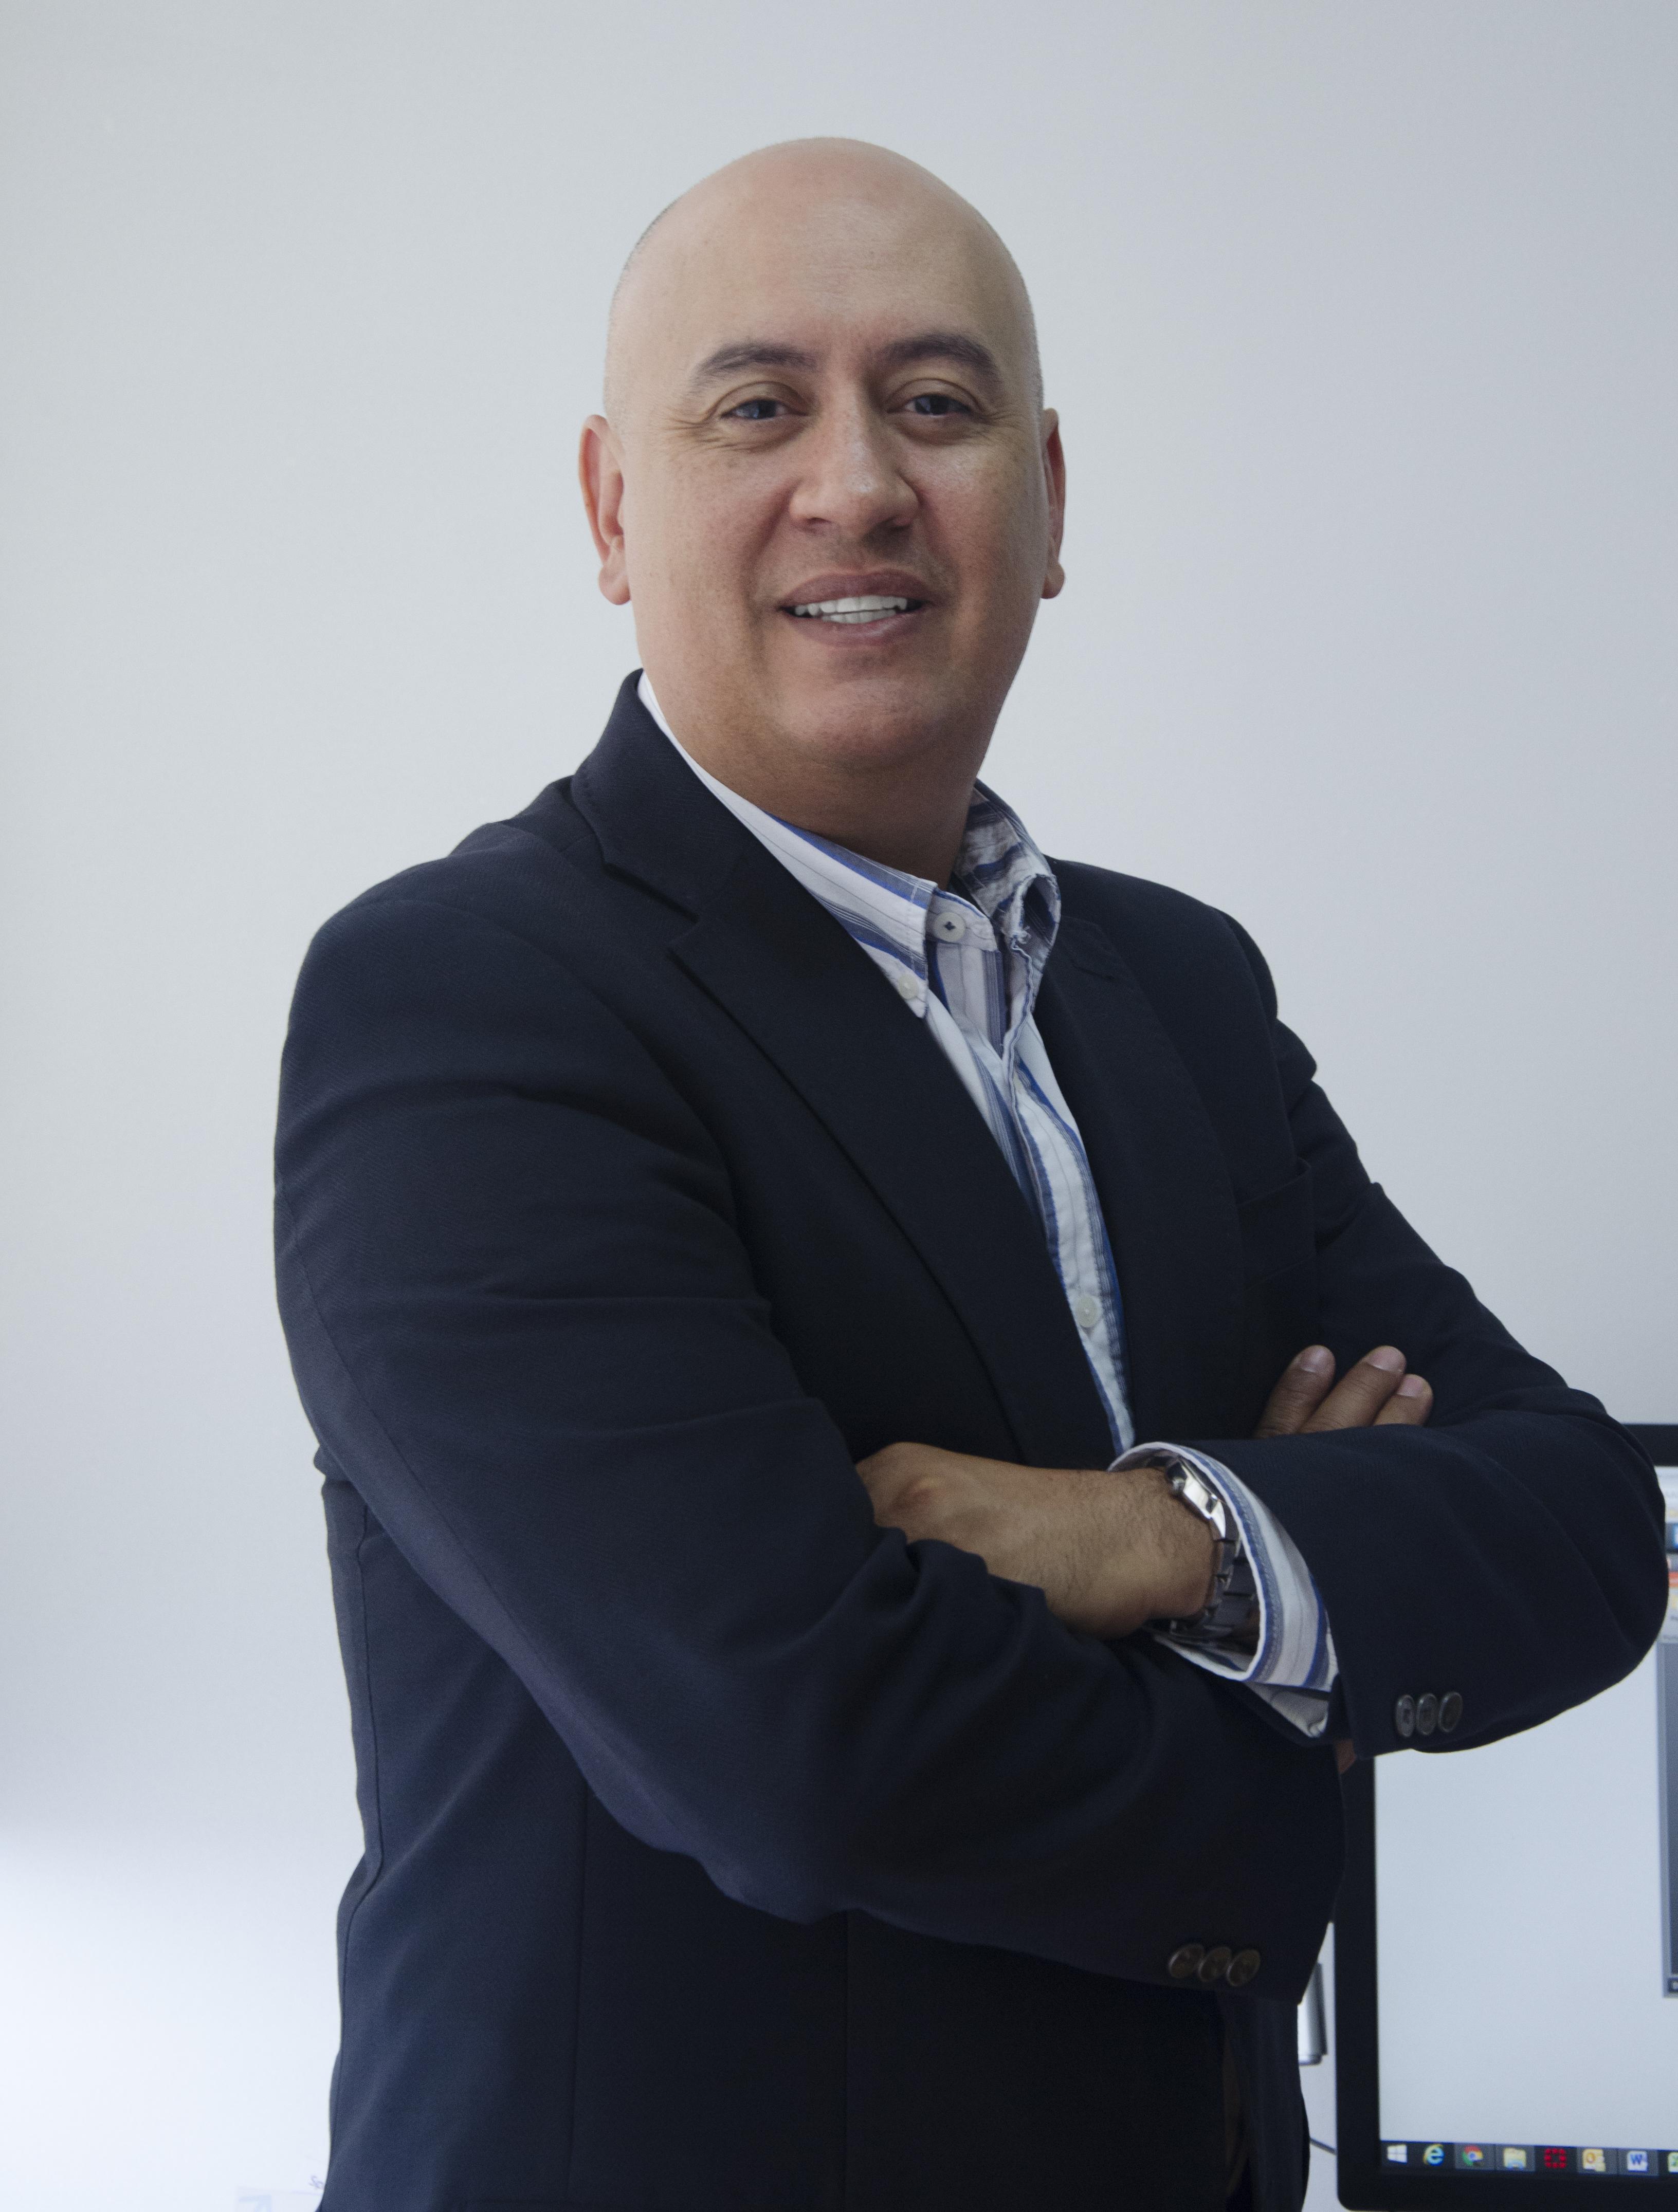 Jose Gaviria